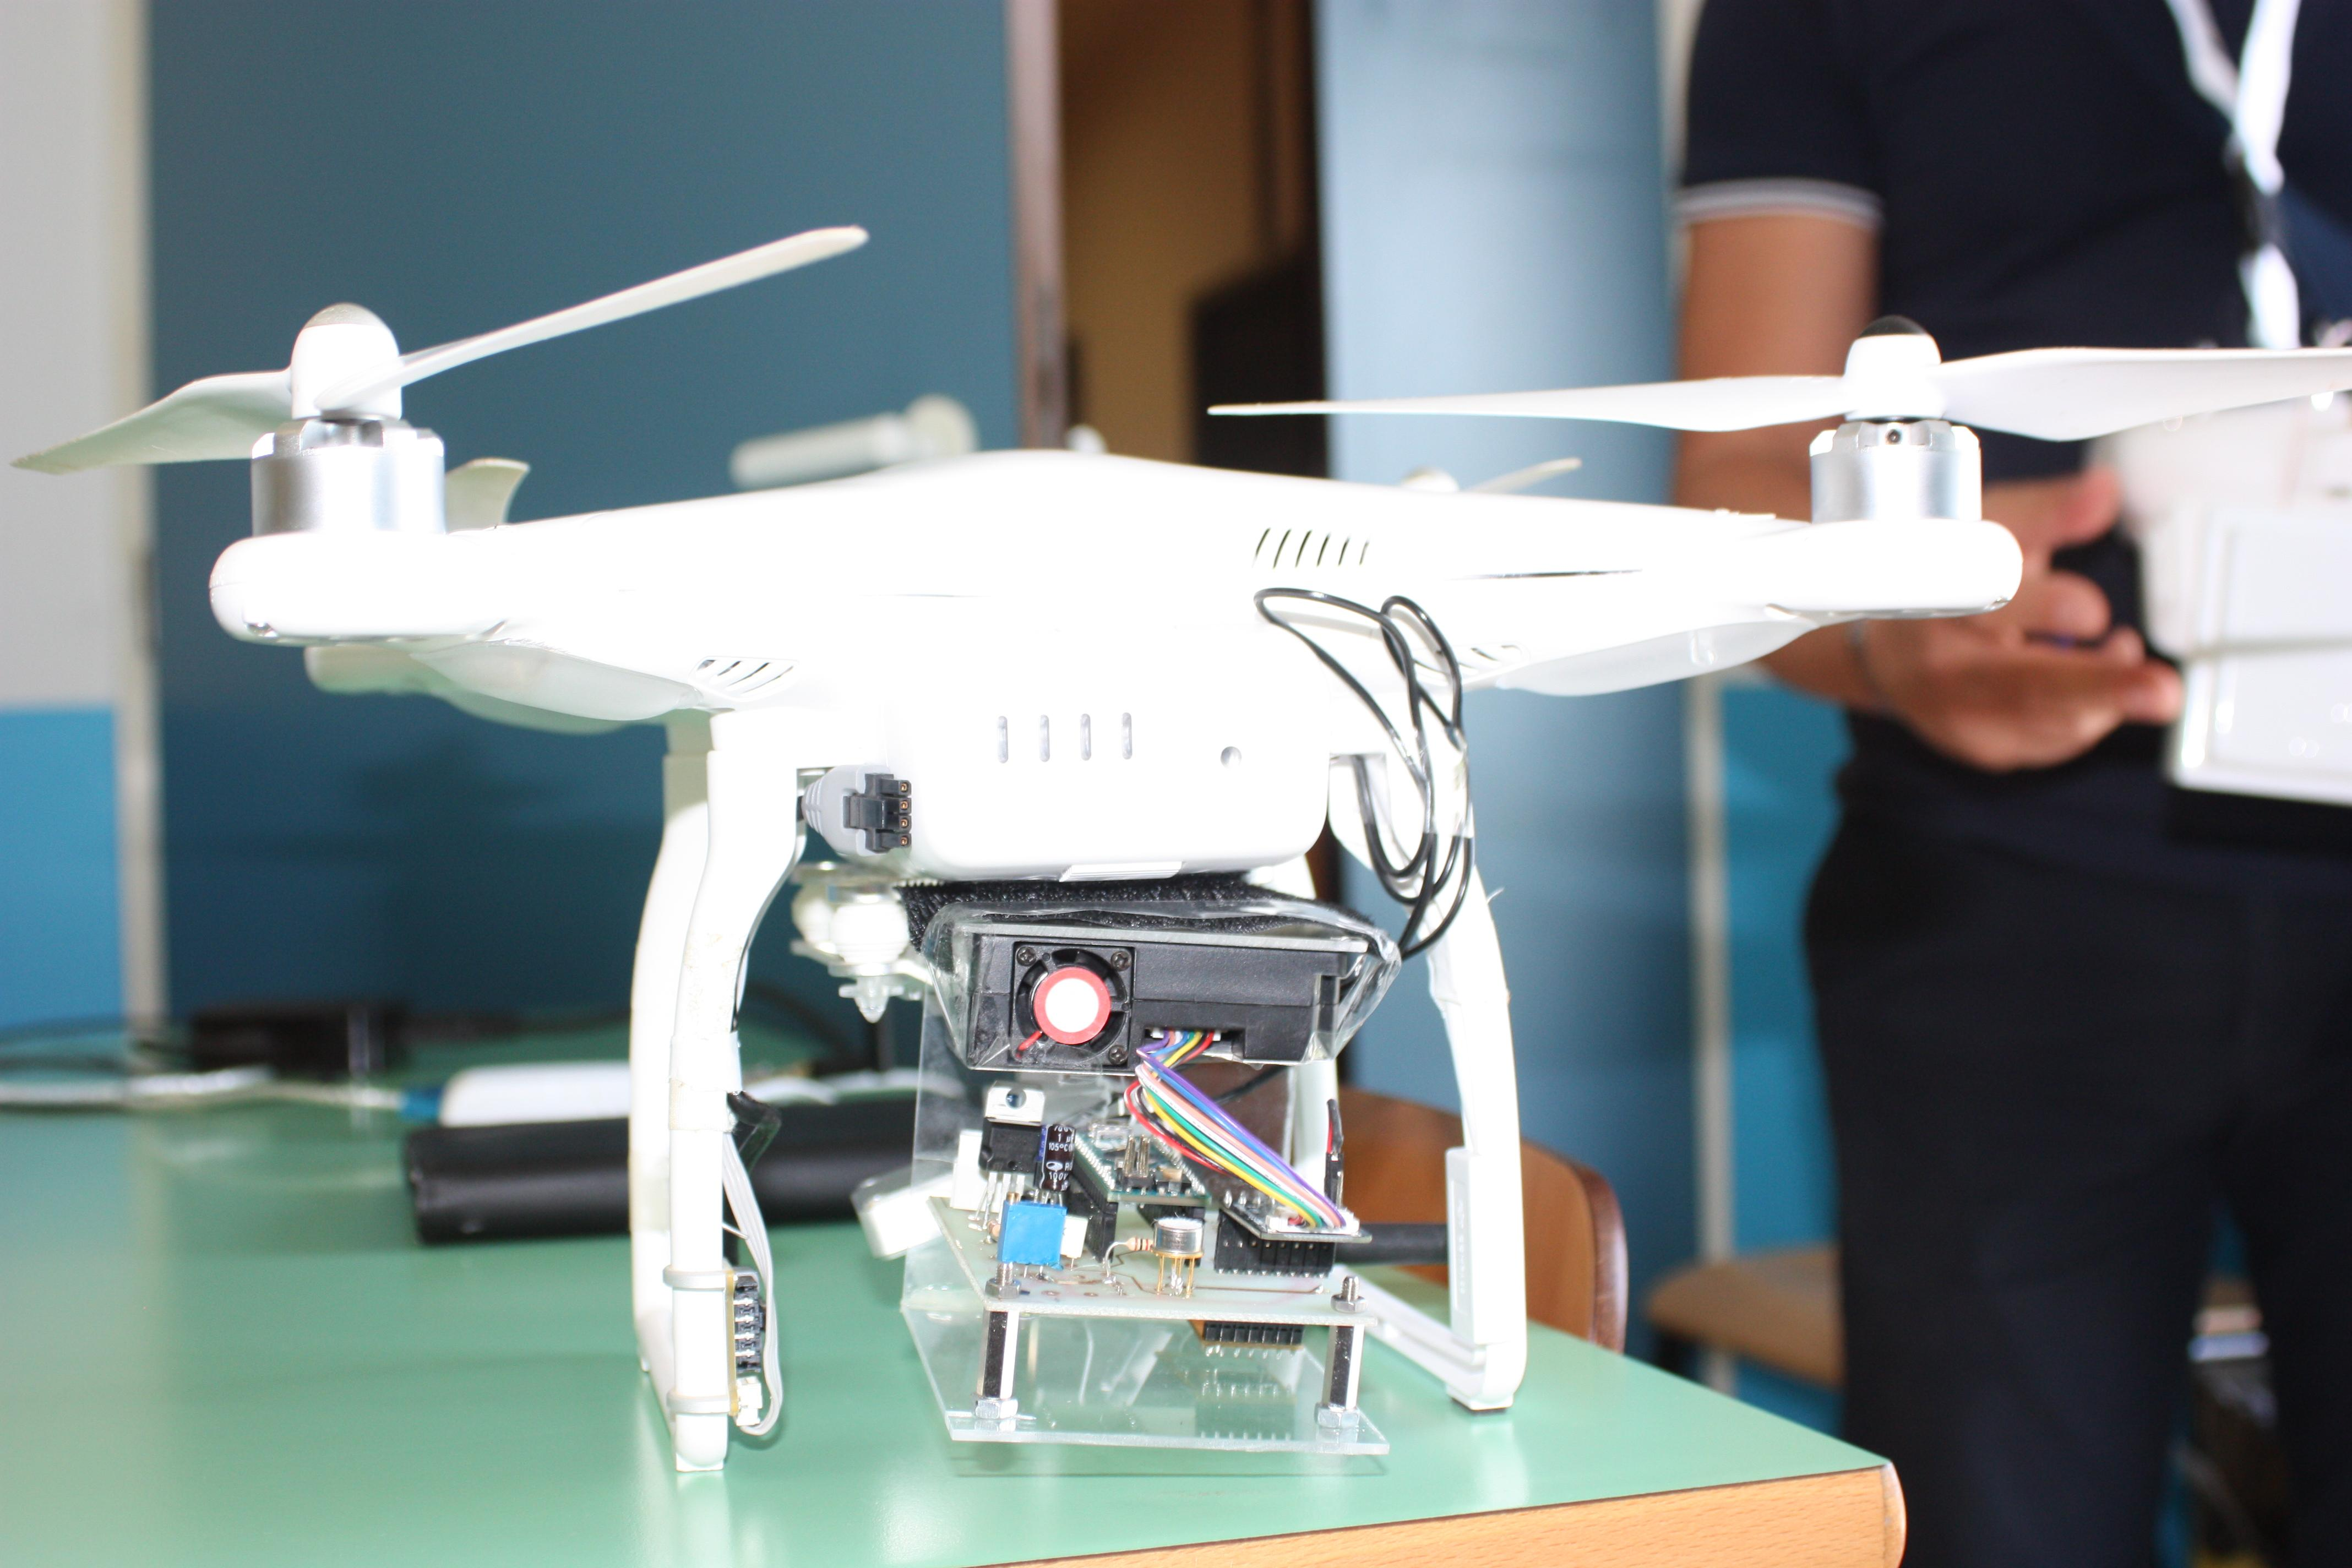 DRONE AIR QUALITY